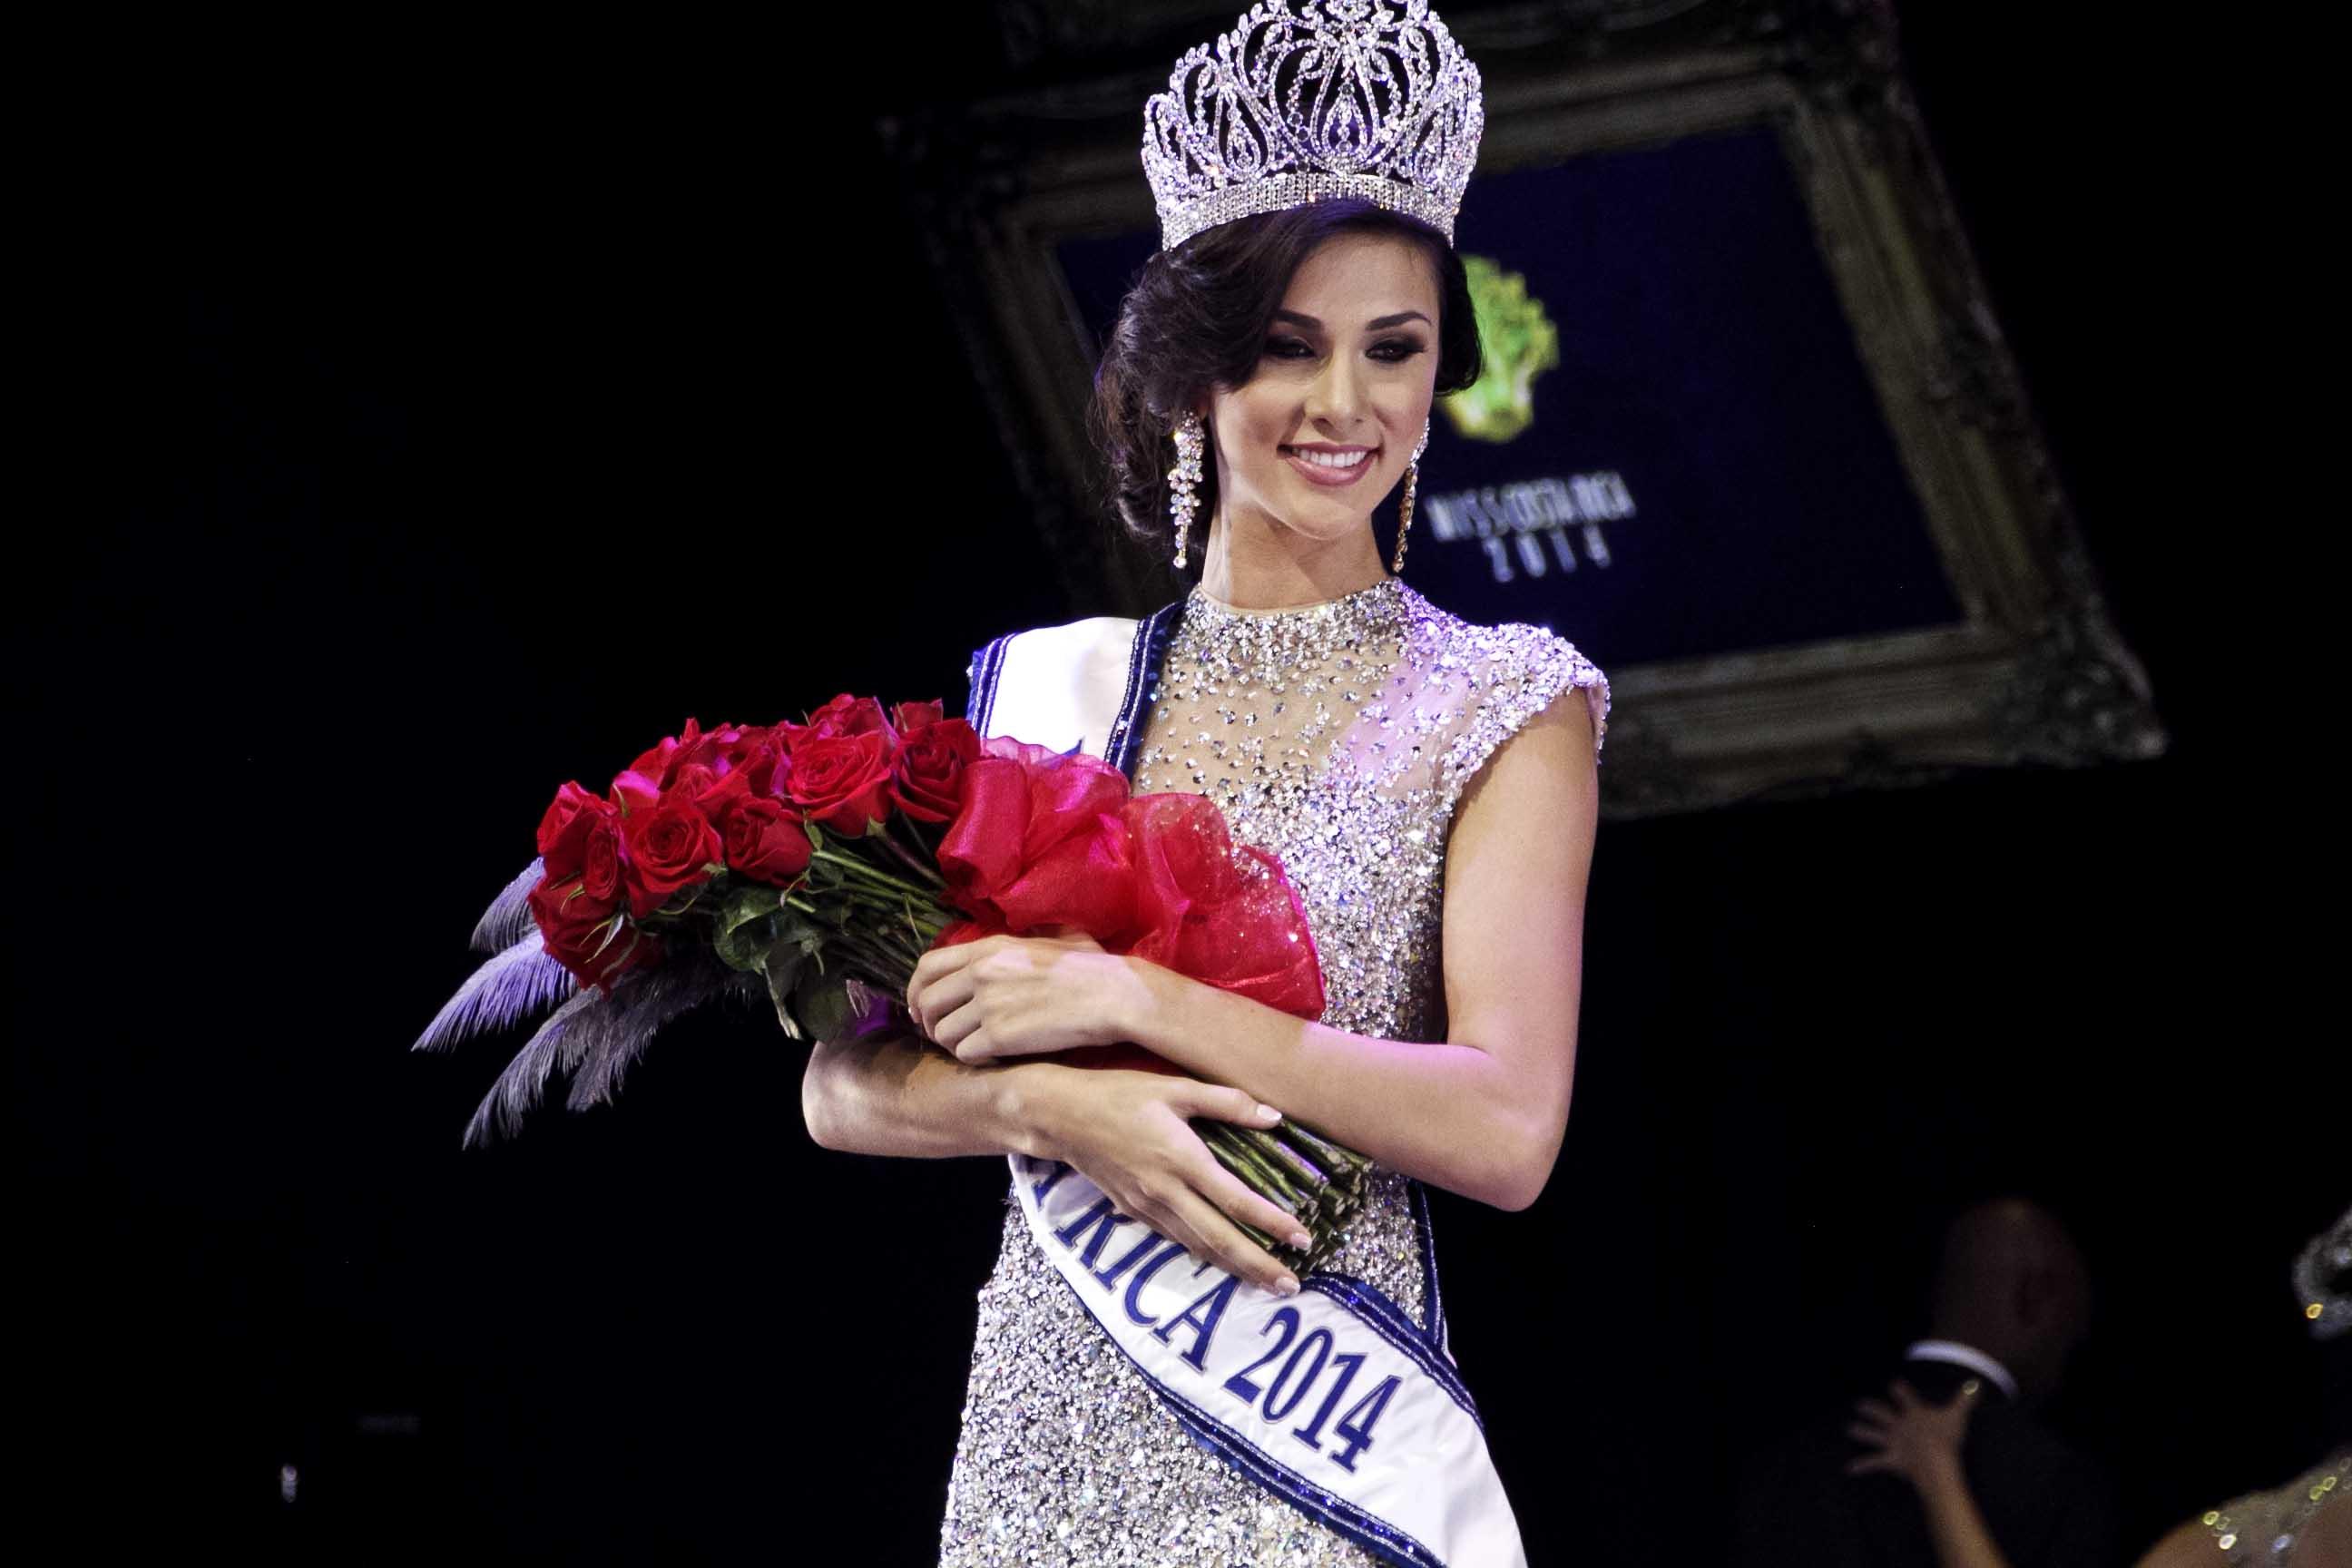 Karina Ramos, Miss Costa Rica 2014